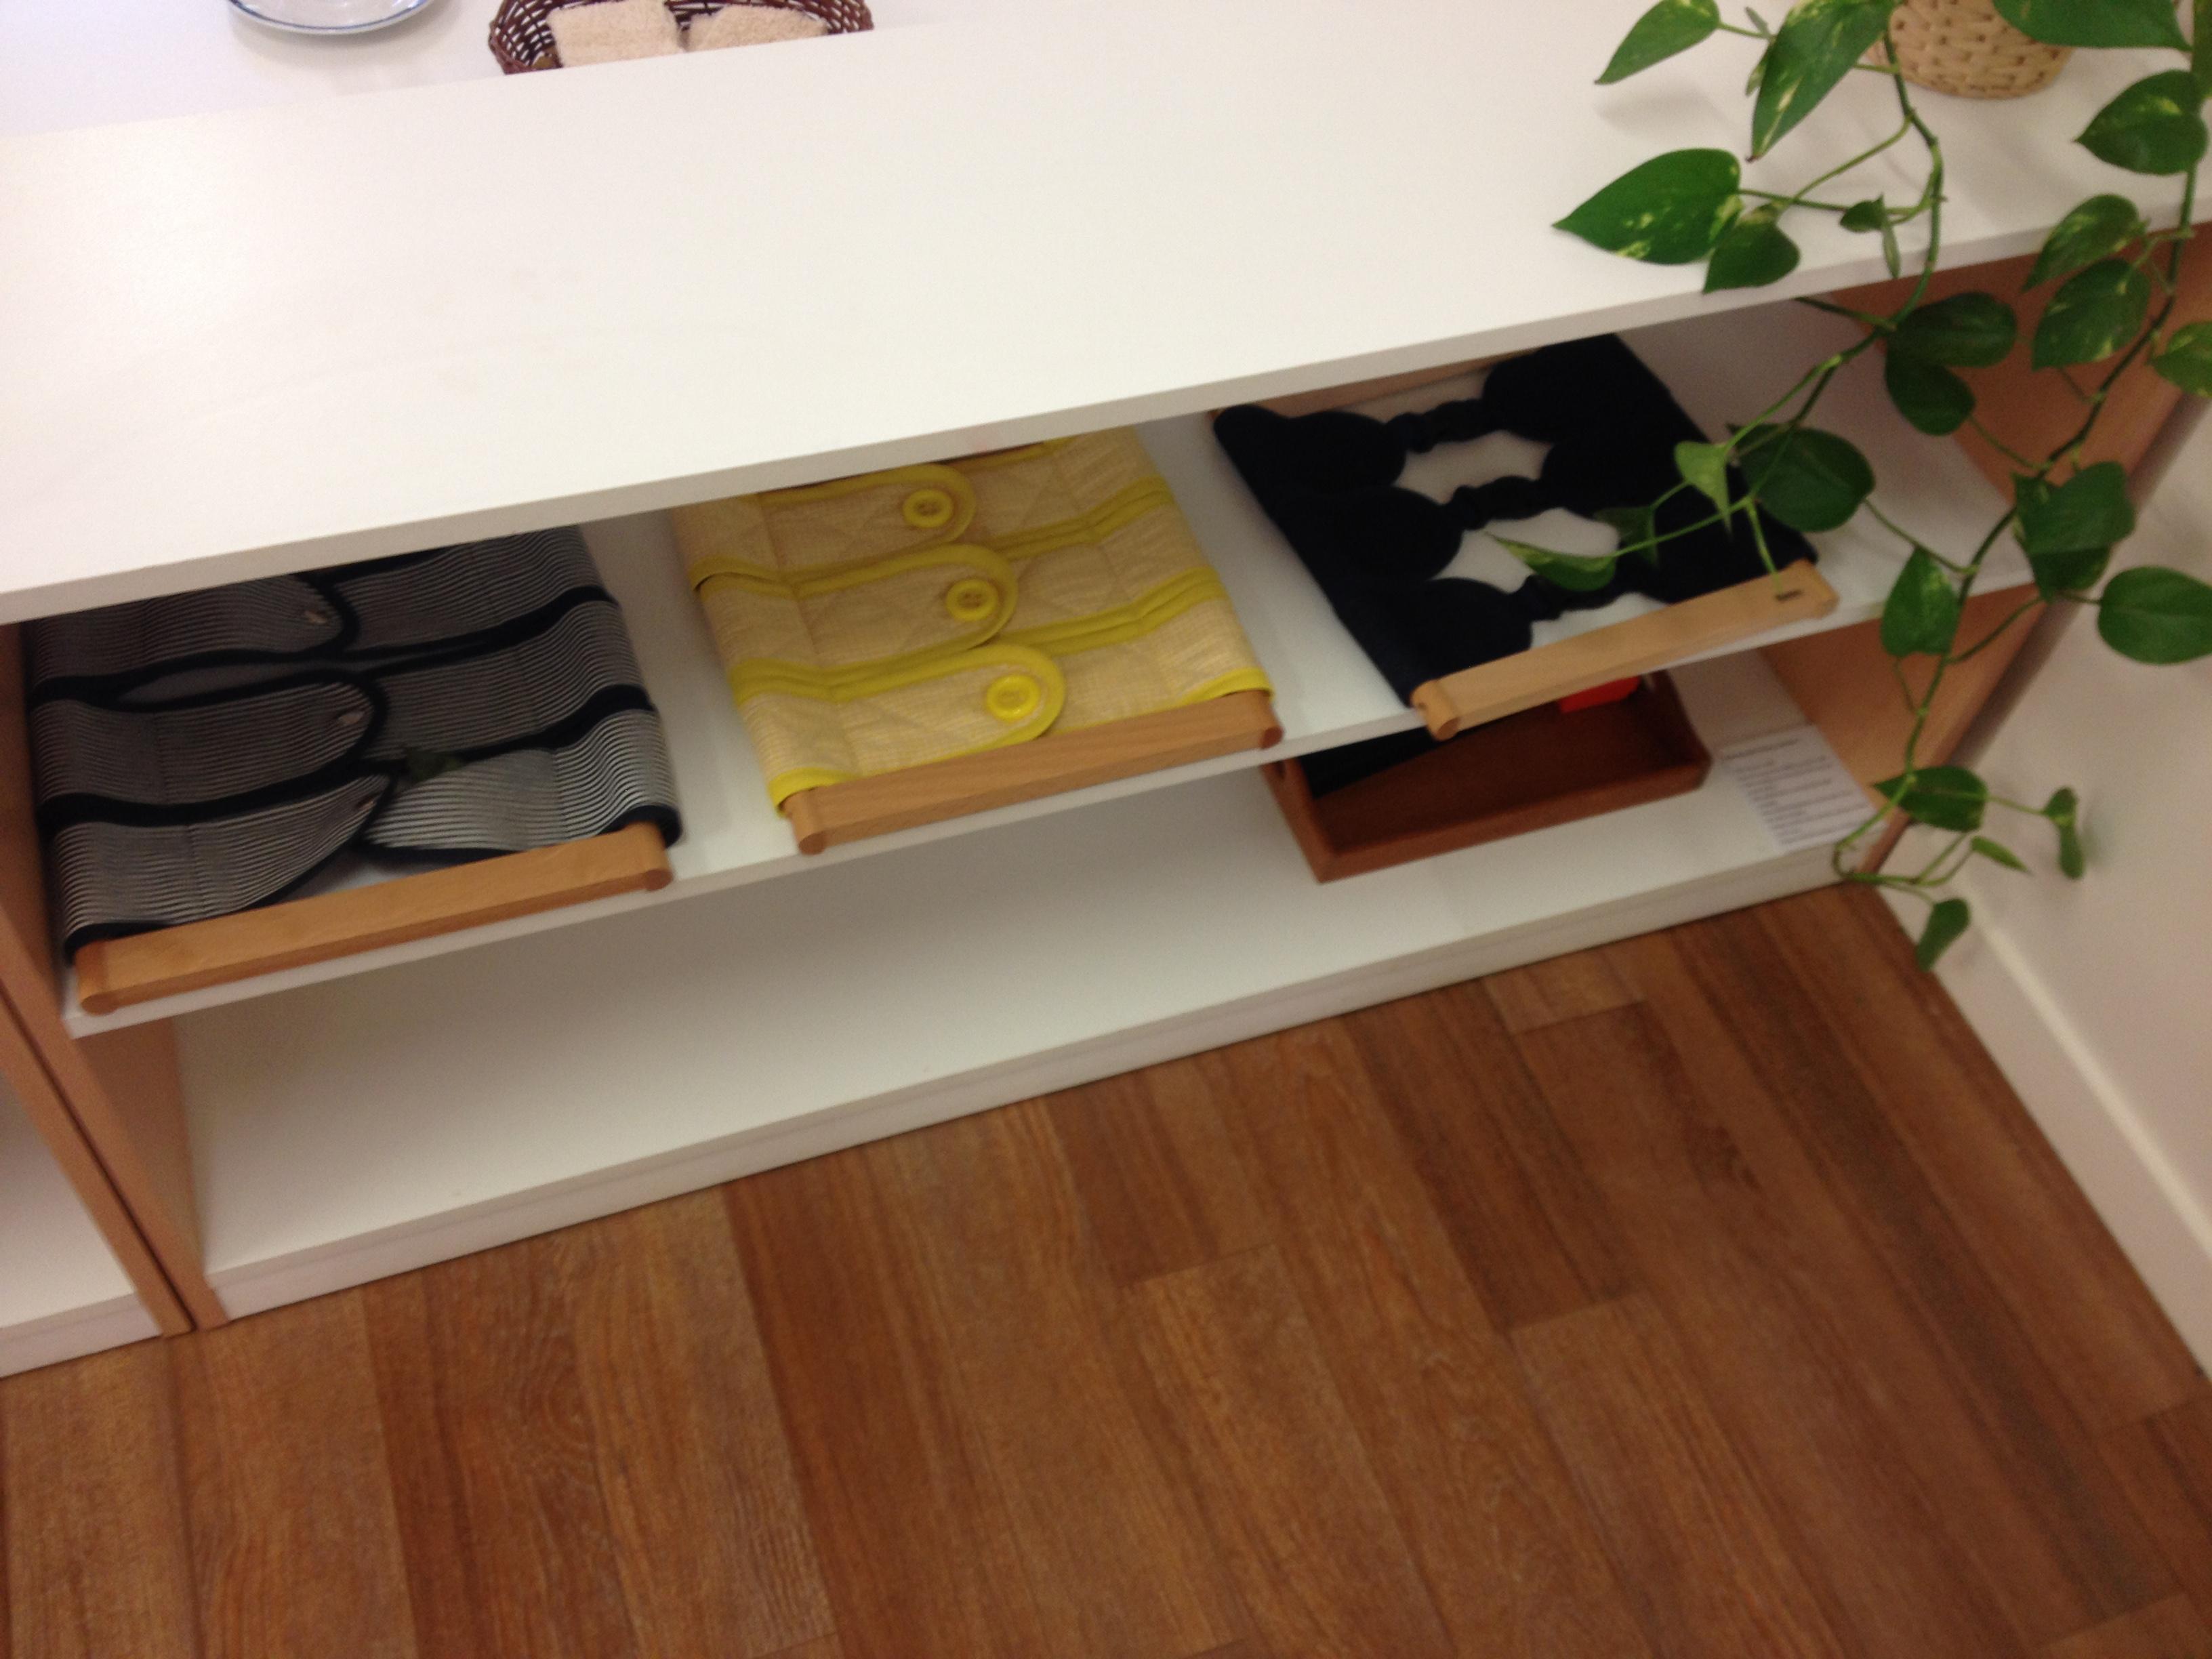 dressing-frames